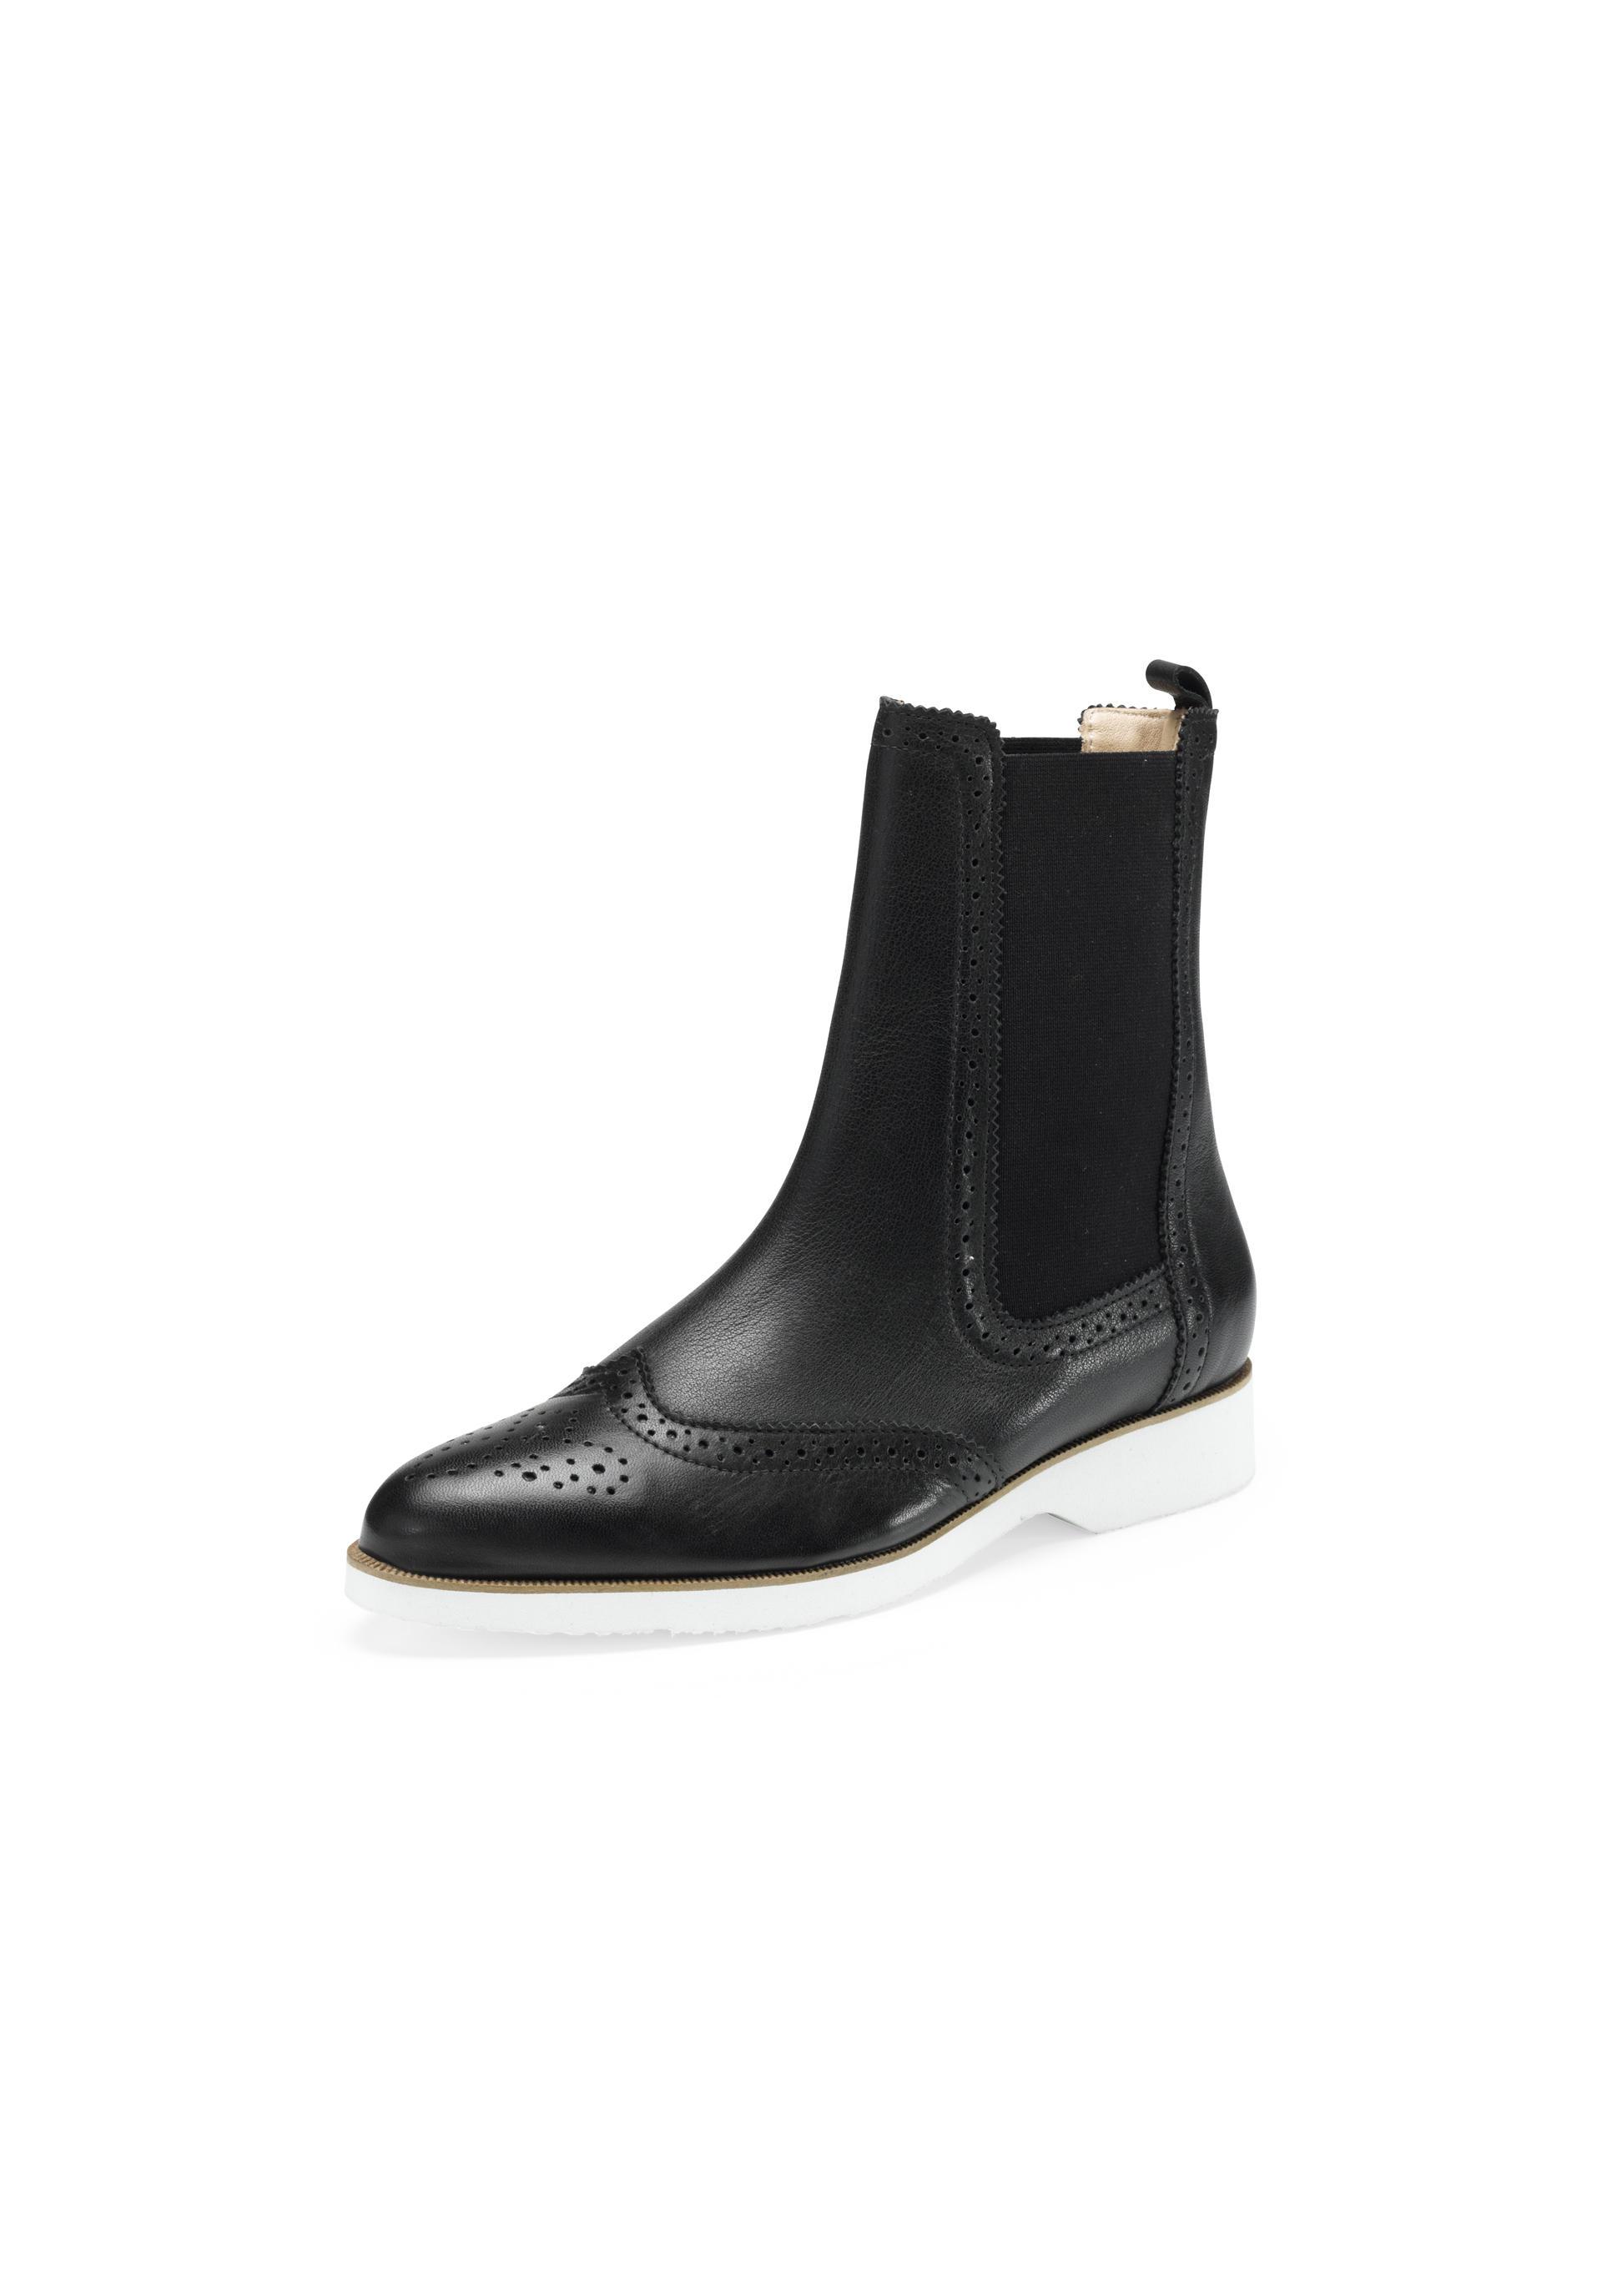 chelsea boots leder damen marco polo chelsea boots damen sie chelsea boots damen big discount. Black Bedroom Furniture Sets. Home Design Ideas